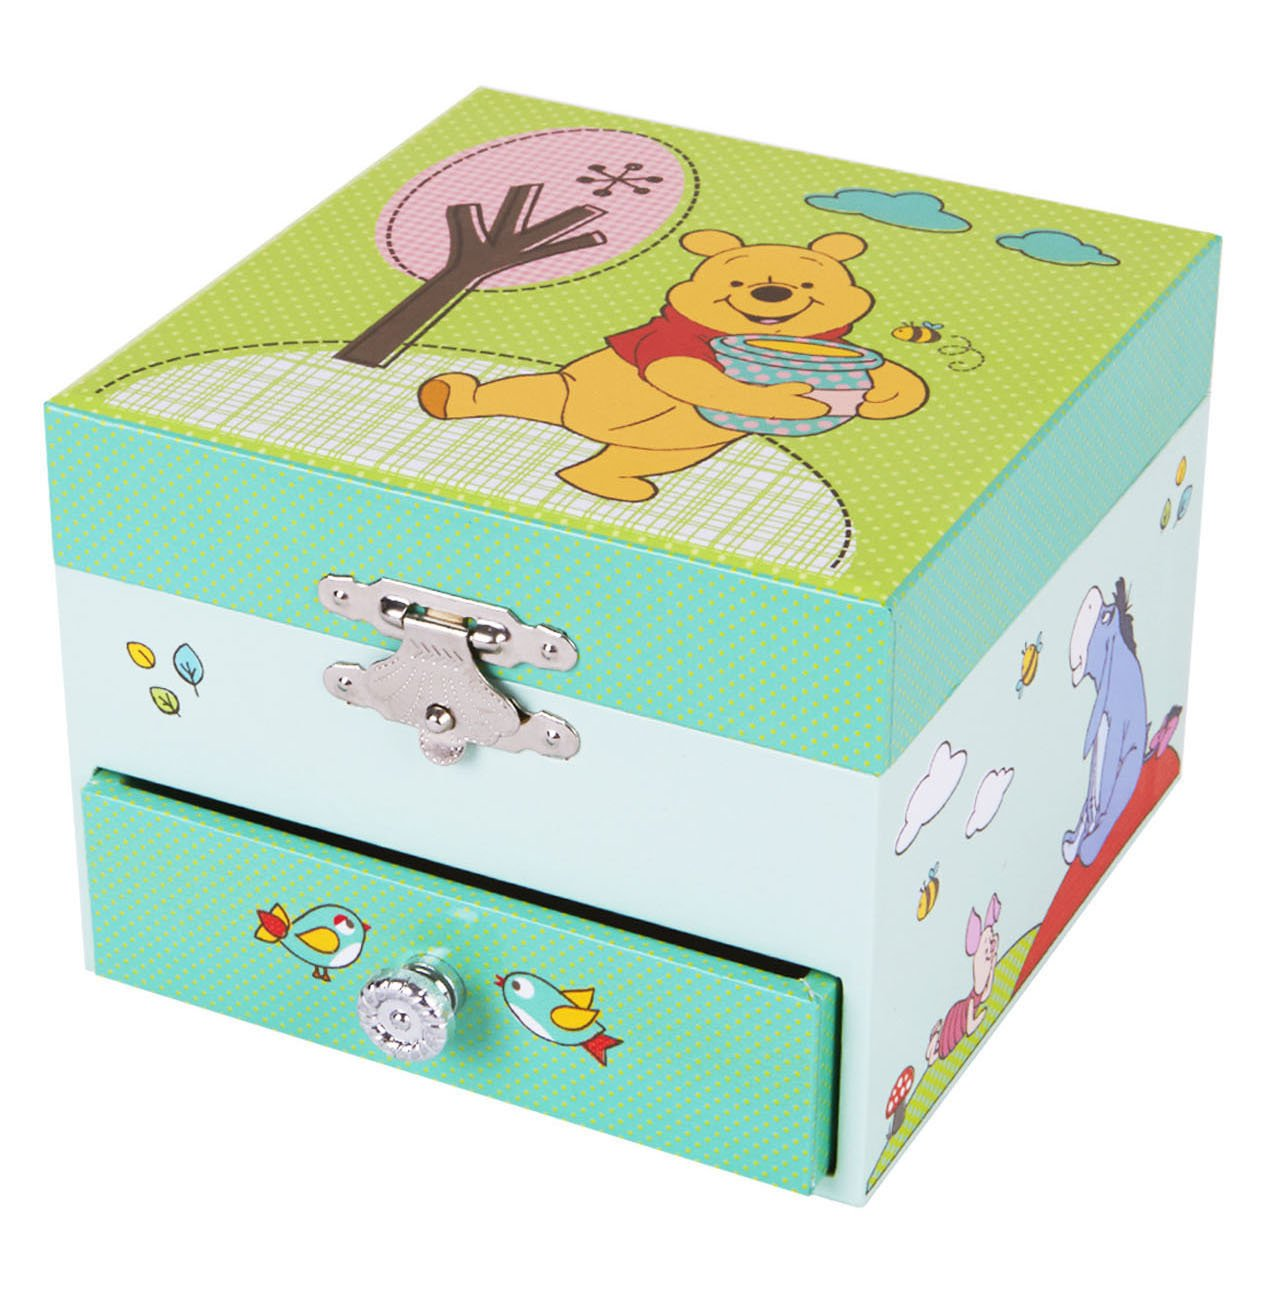 Trousselier Winnie The Pooh Musical Cube Box TROUS20100